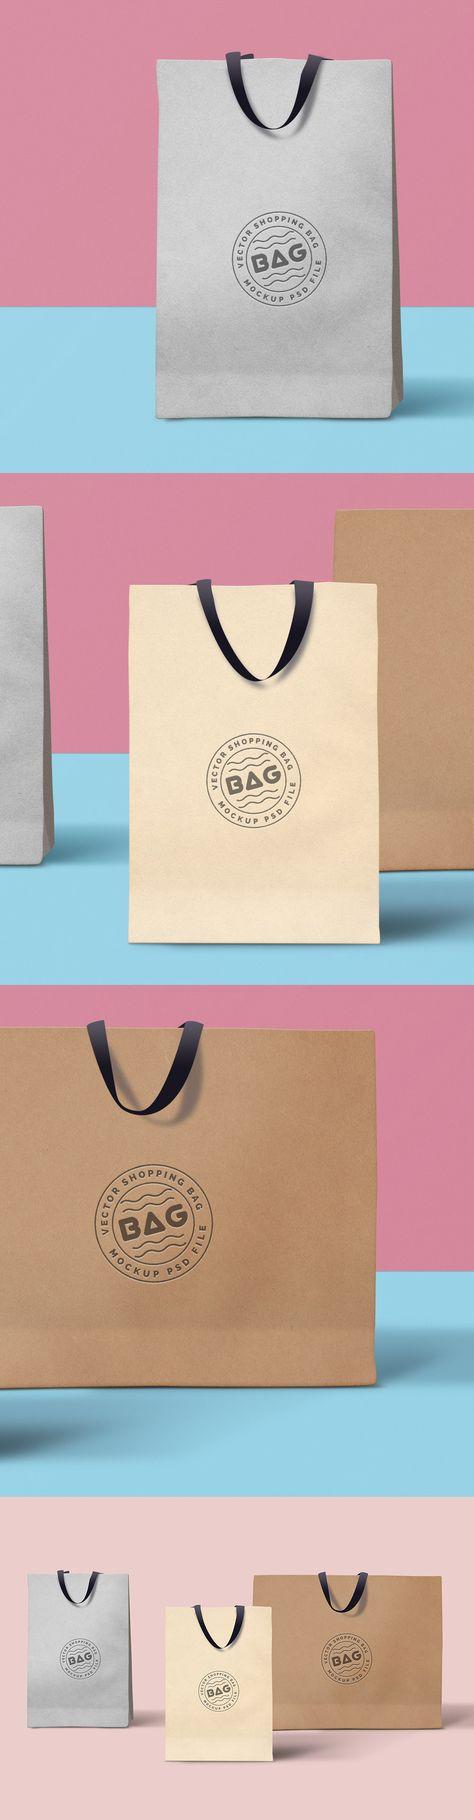 Download Shopping Bags Psd Template Graphicsfuel Bag Mockup Mockup Graphic Design Mockup